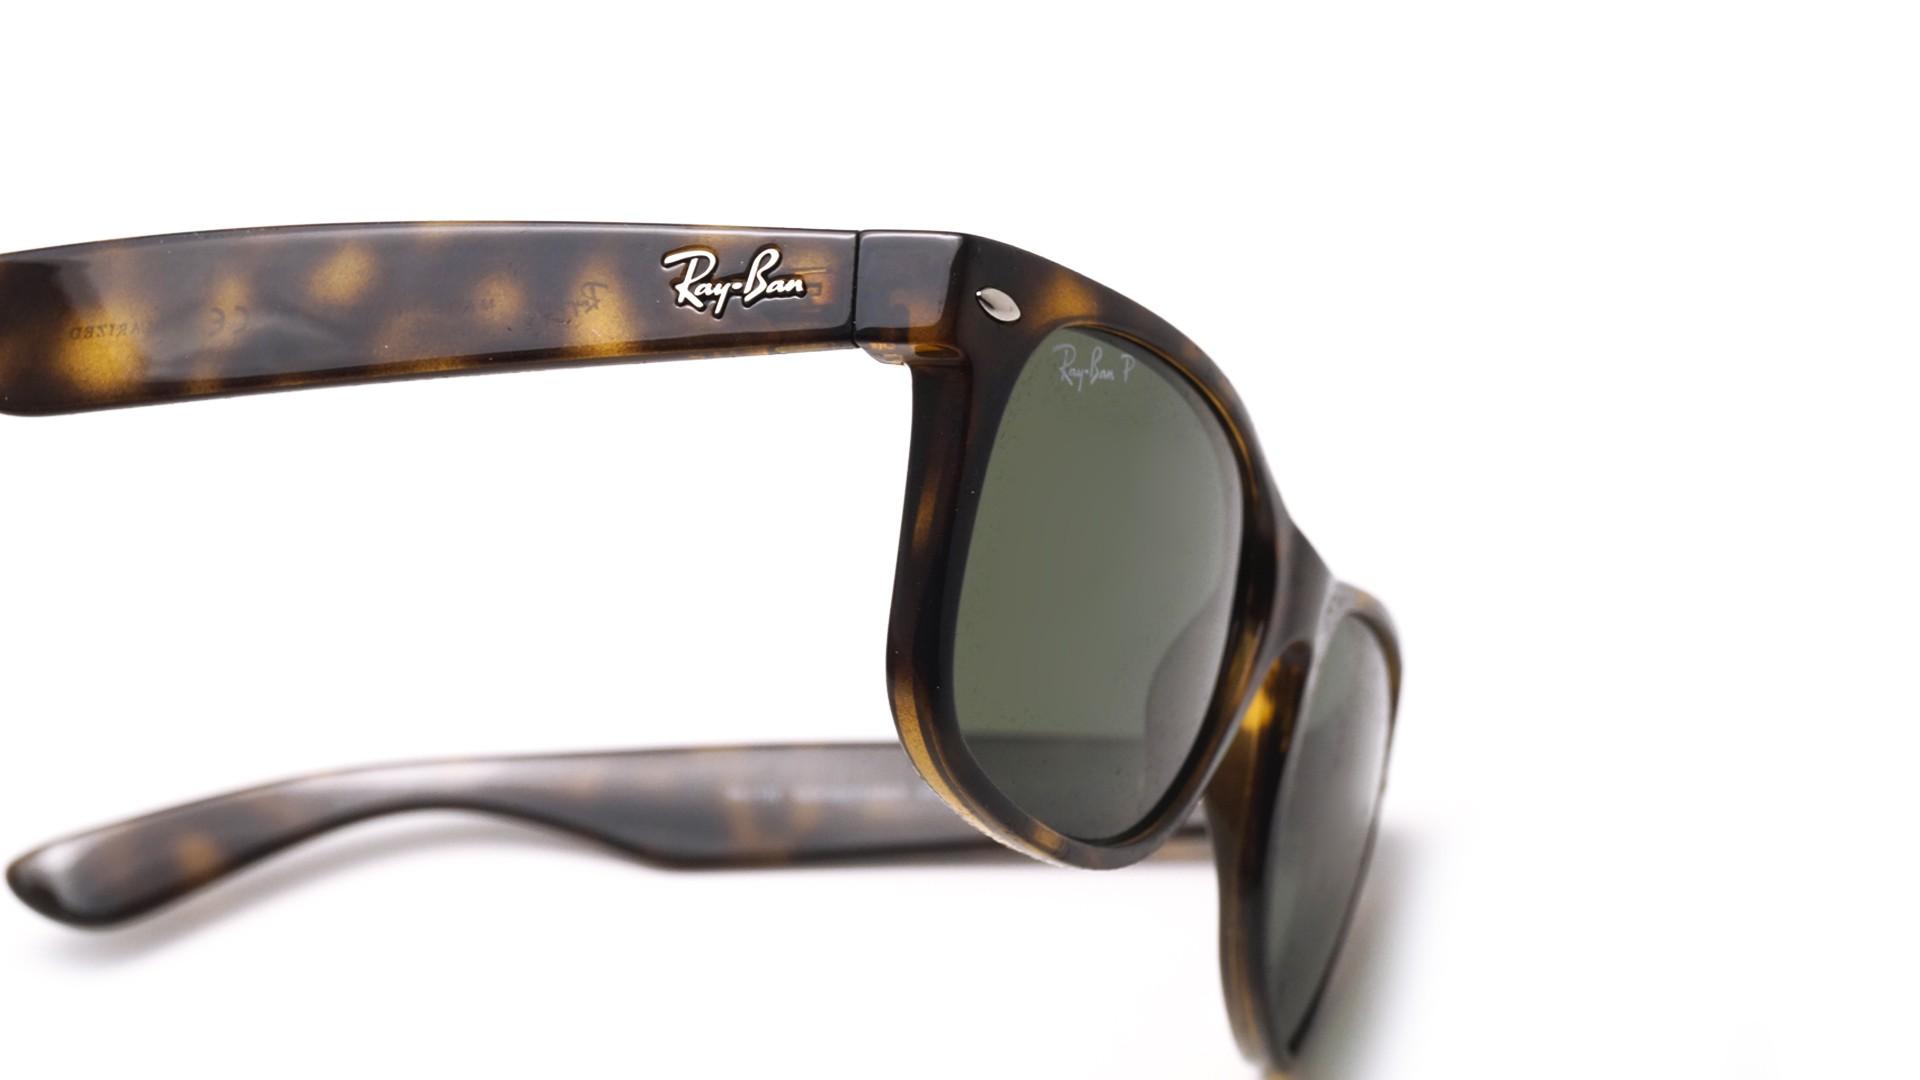 e8857fb3efe Sunglasses Ray-Ban New Wayfarer Tortoise RB2132 902 58 55-18 Large Polarized